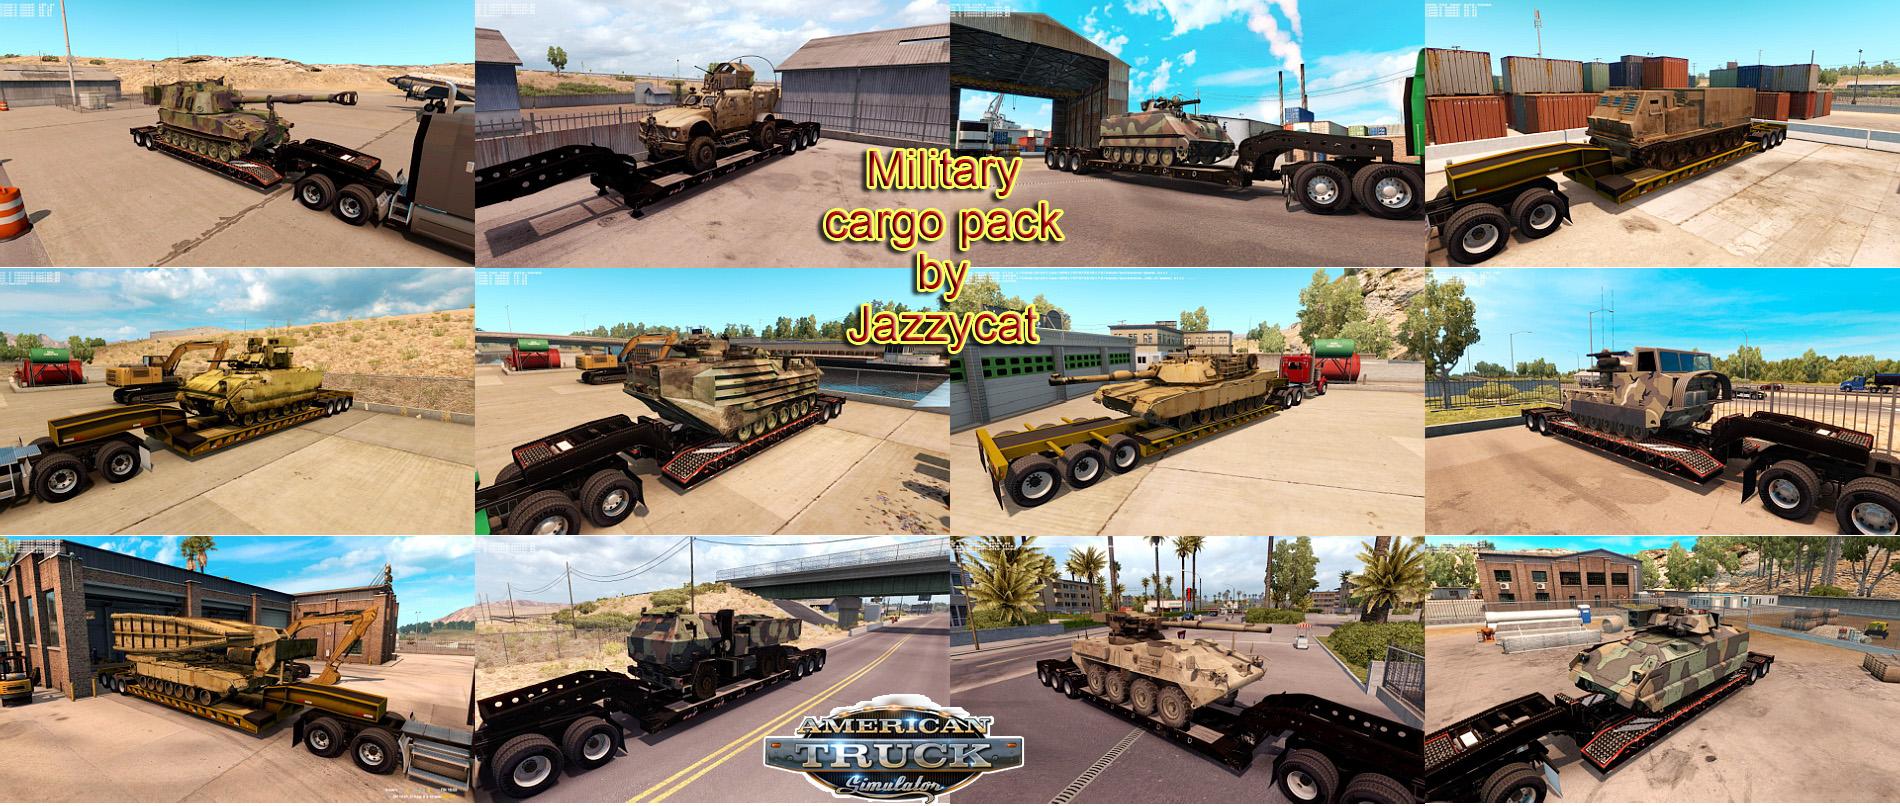 military_cargo_pack_by_Jazzycat_v1.0_ats.jpg